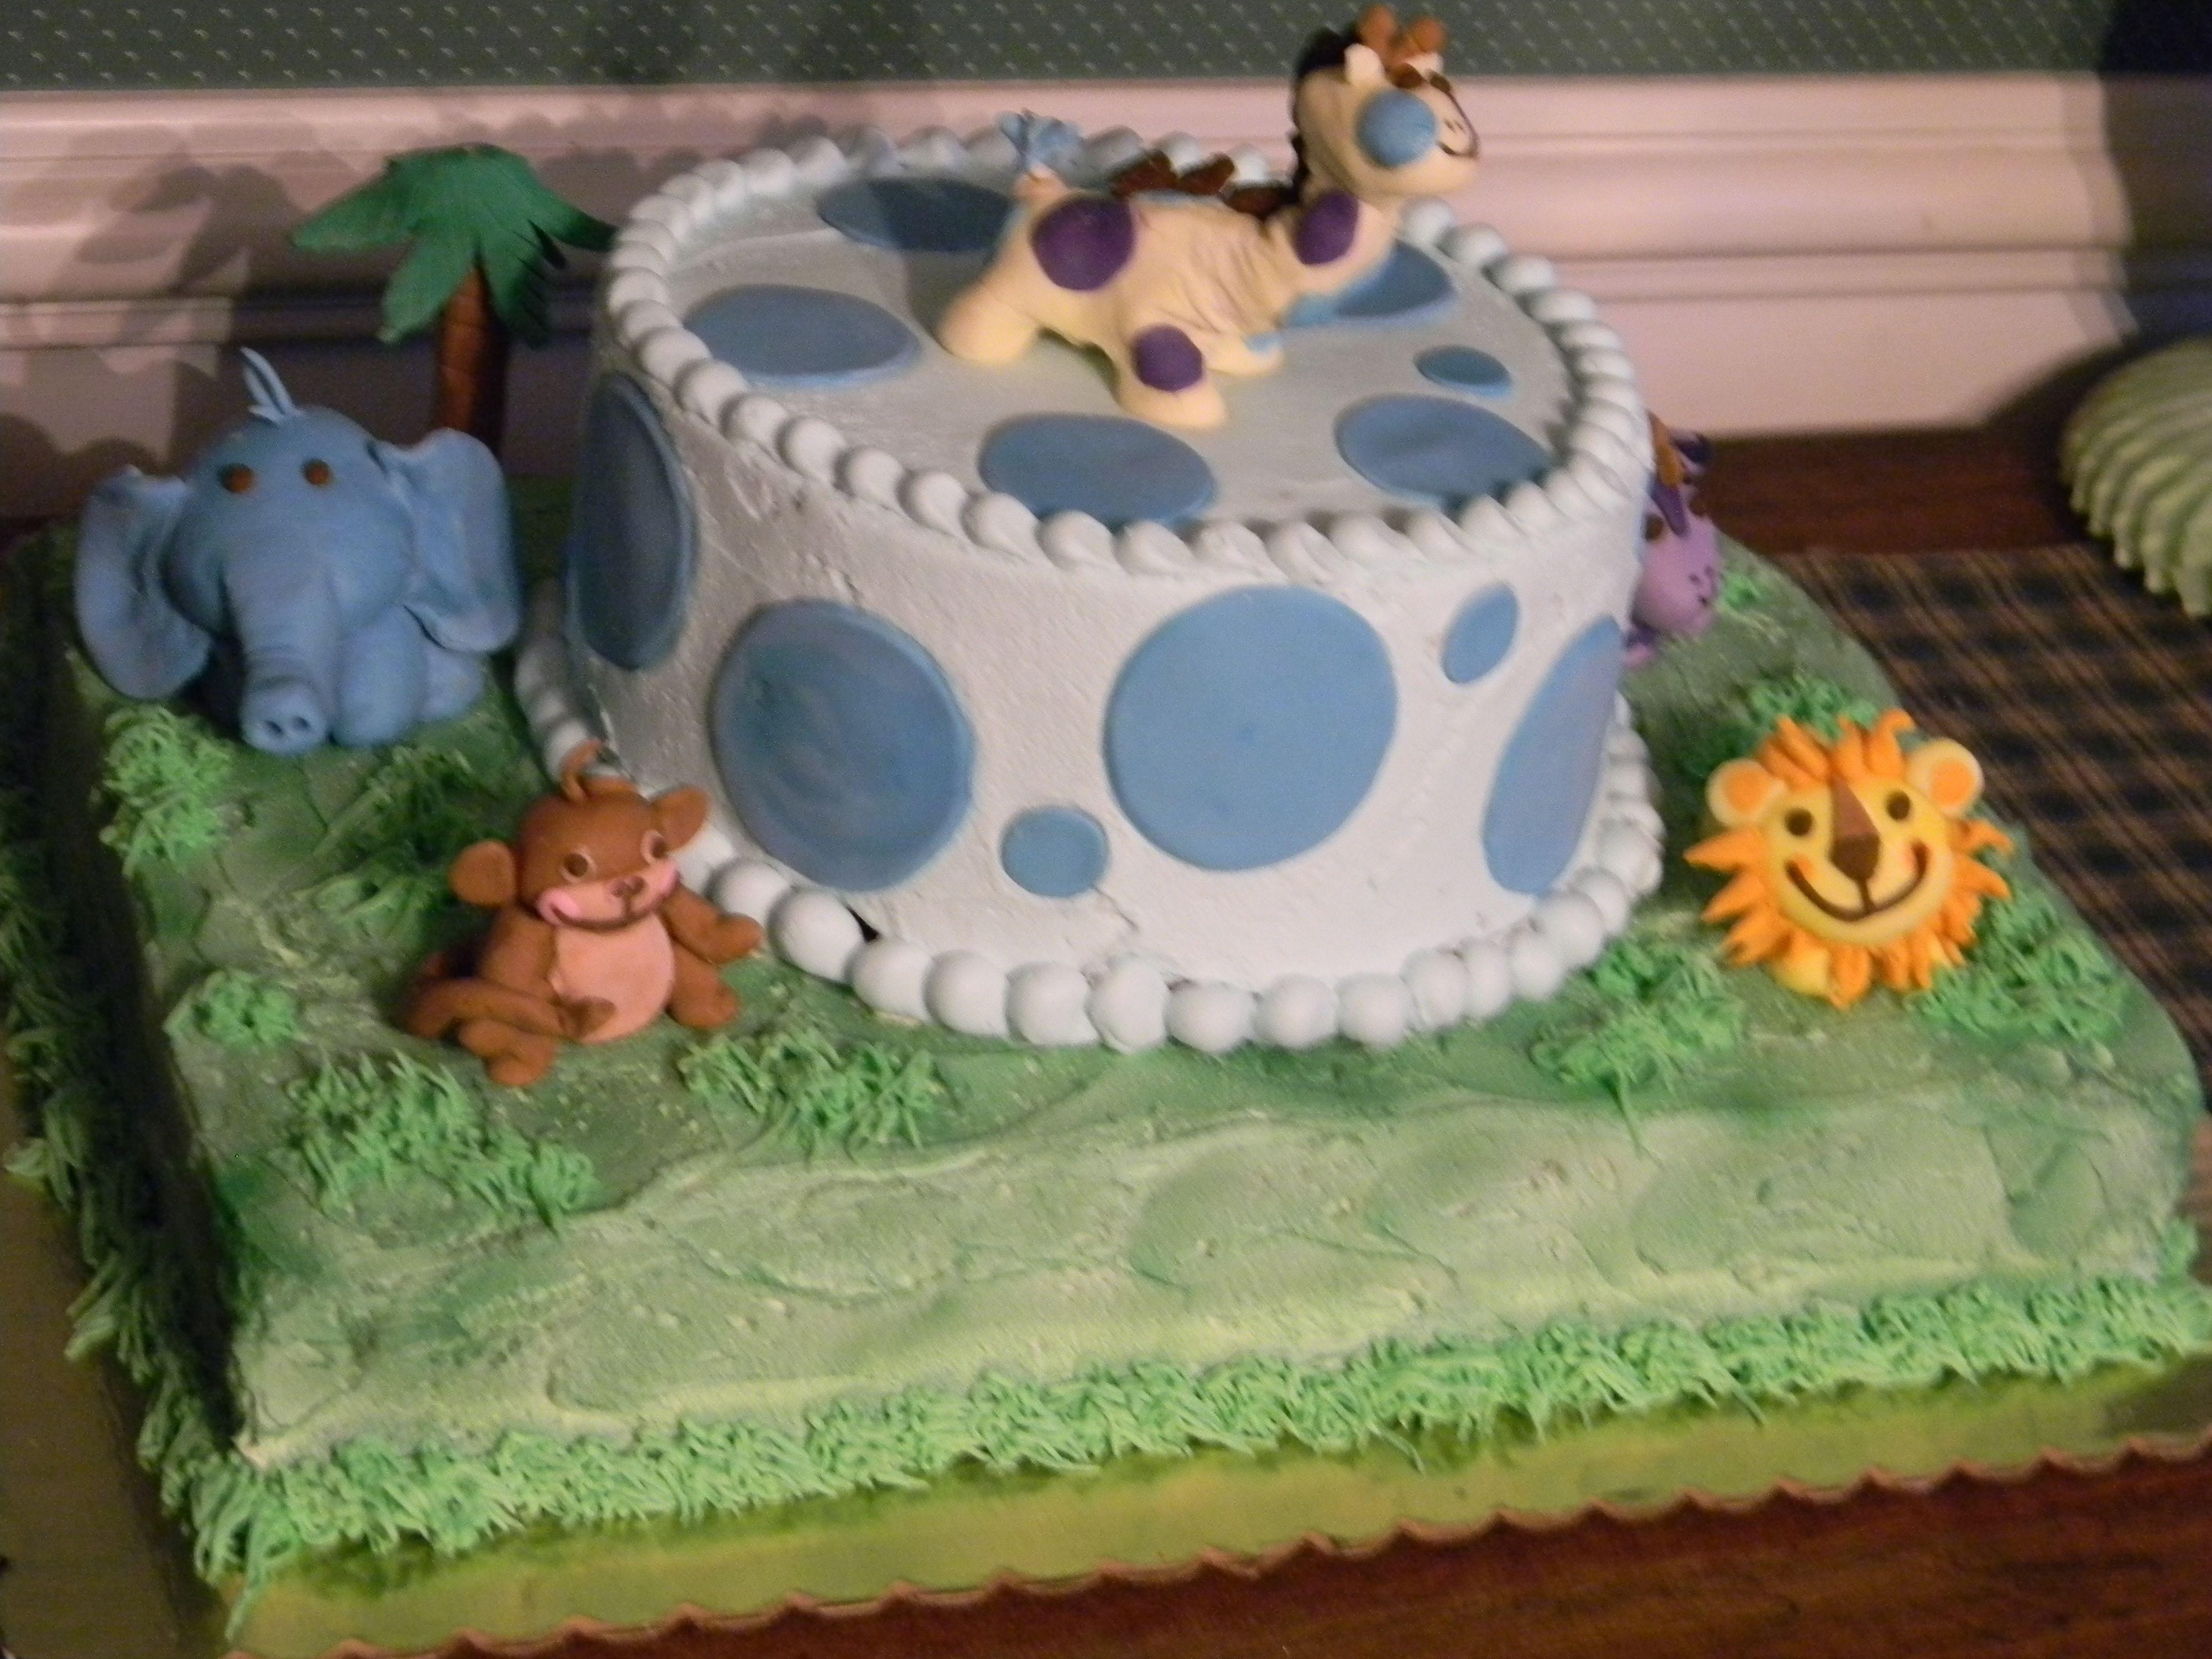 Kimies baby shower cake Darleen from Harris Teeter in Greenbrier